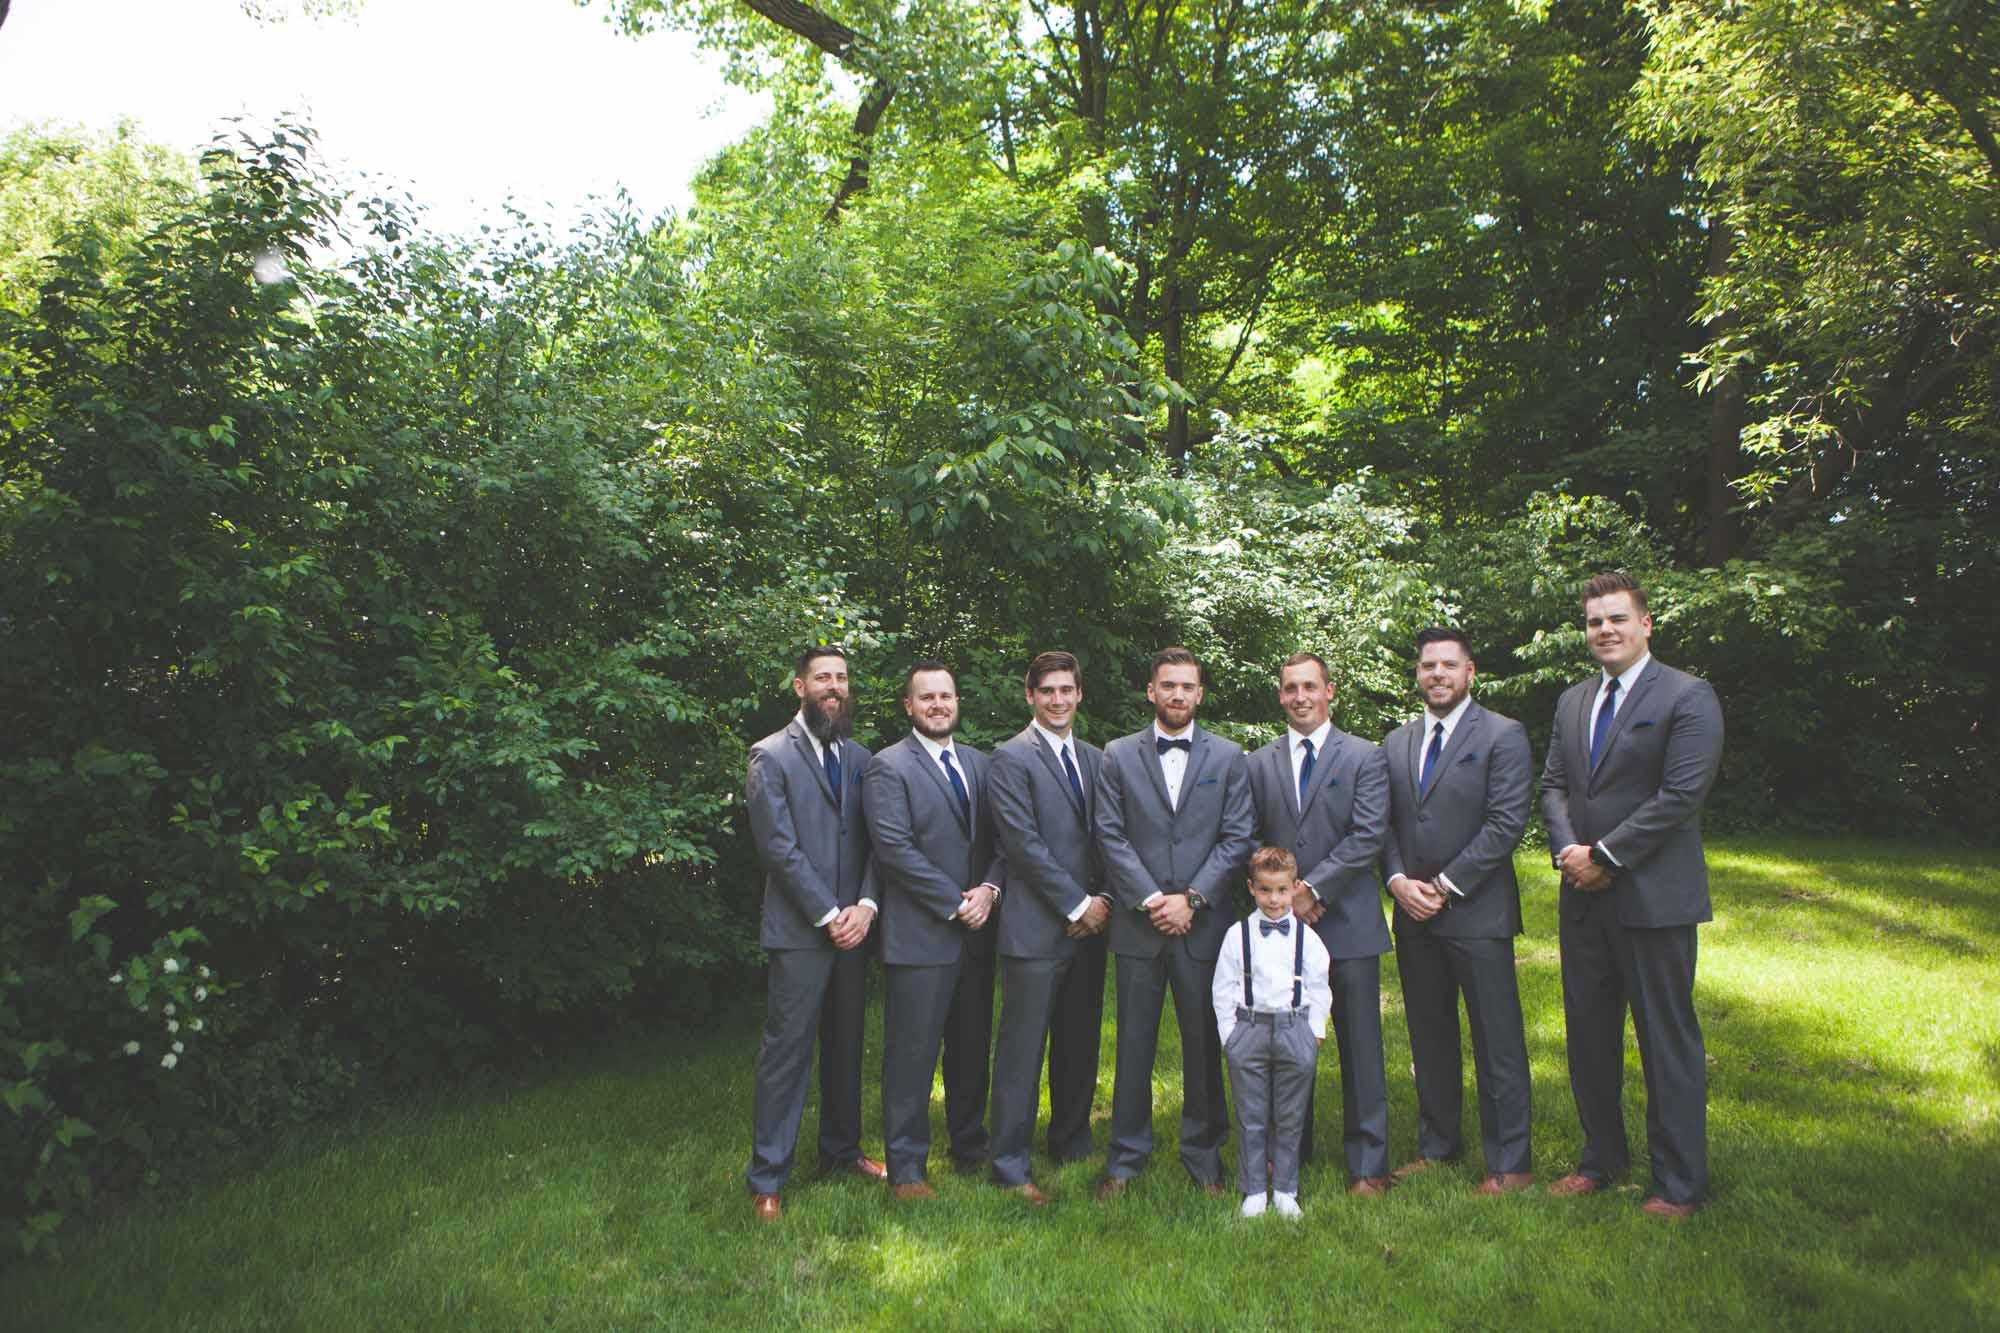 chicago_il_wedding_photography-0203